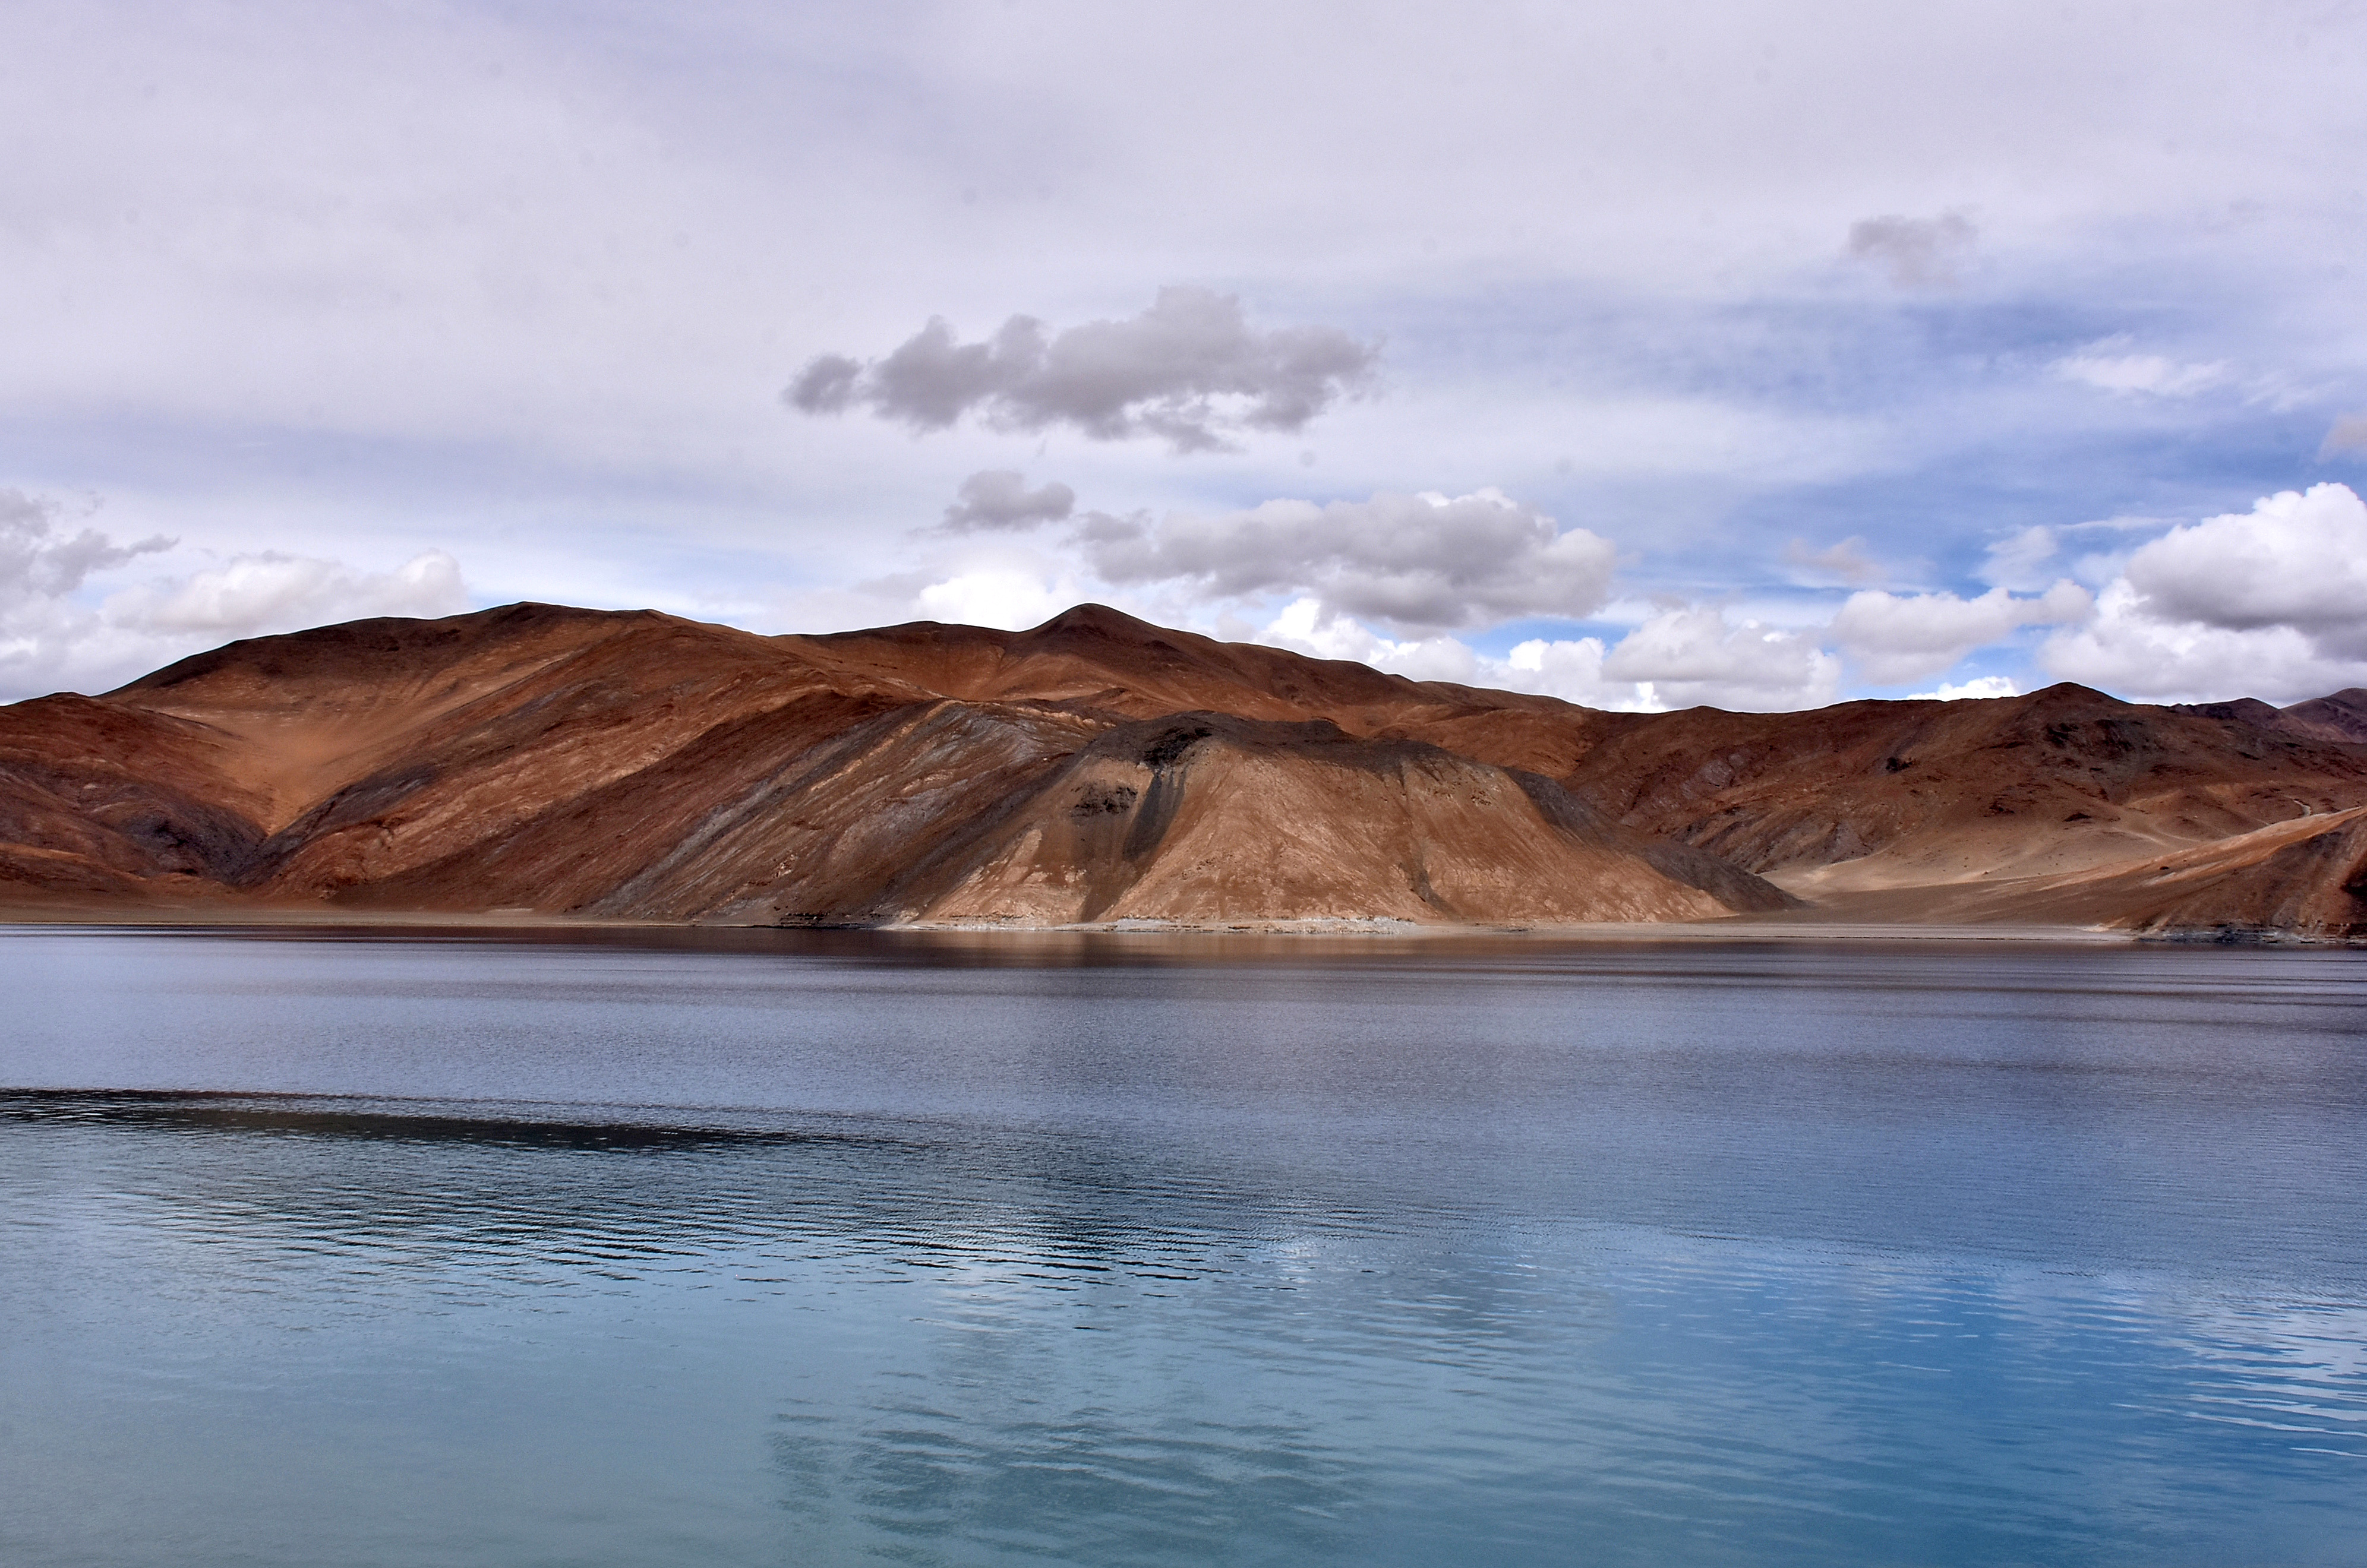 Pangong Tso lake in Ladakh region